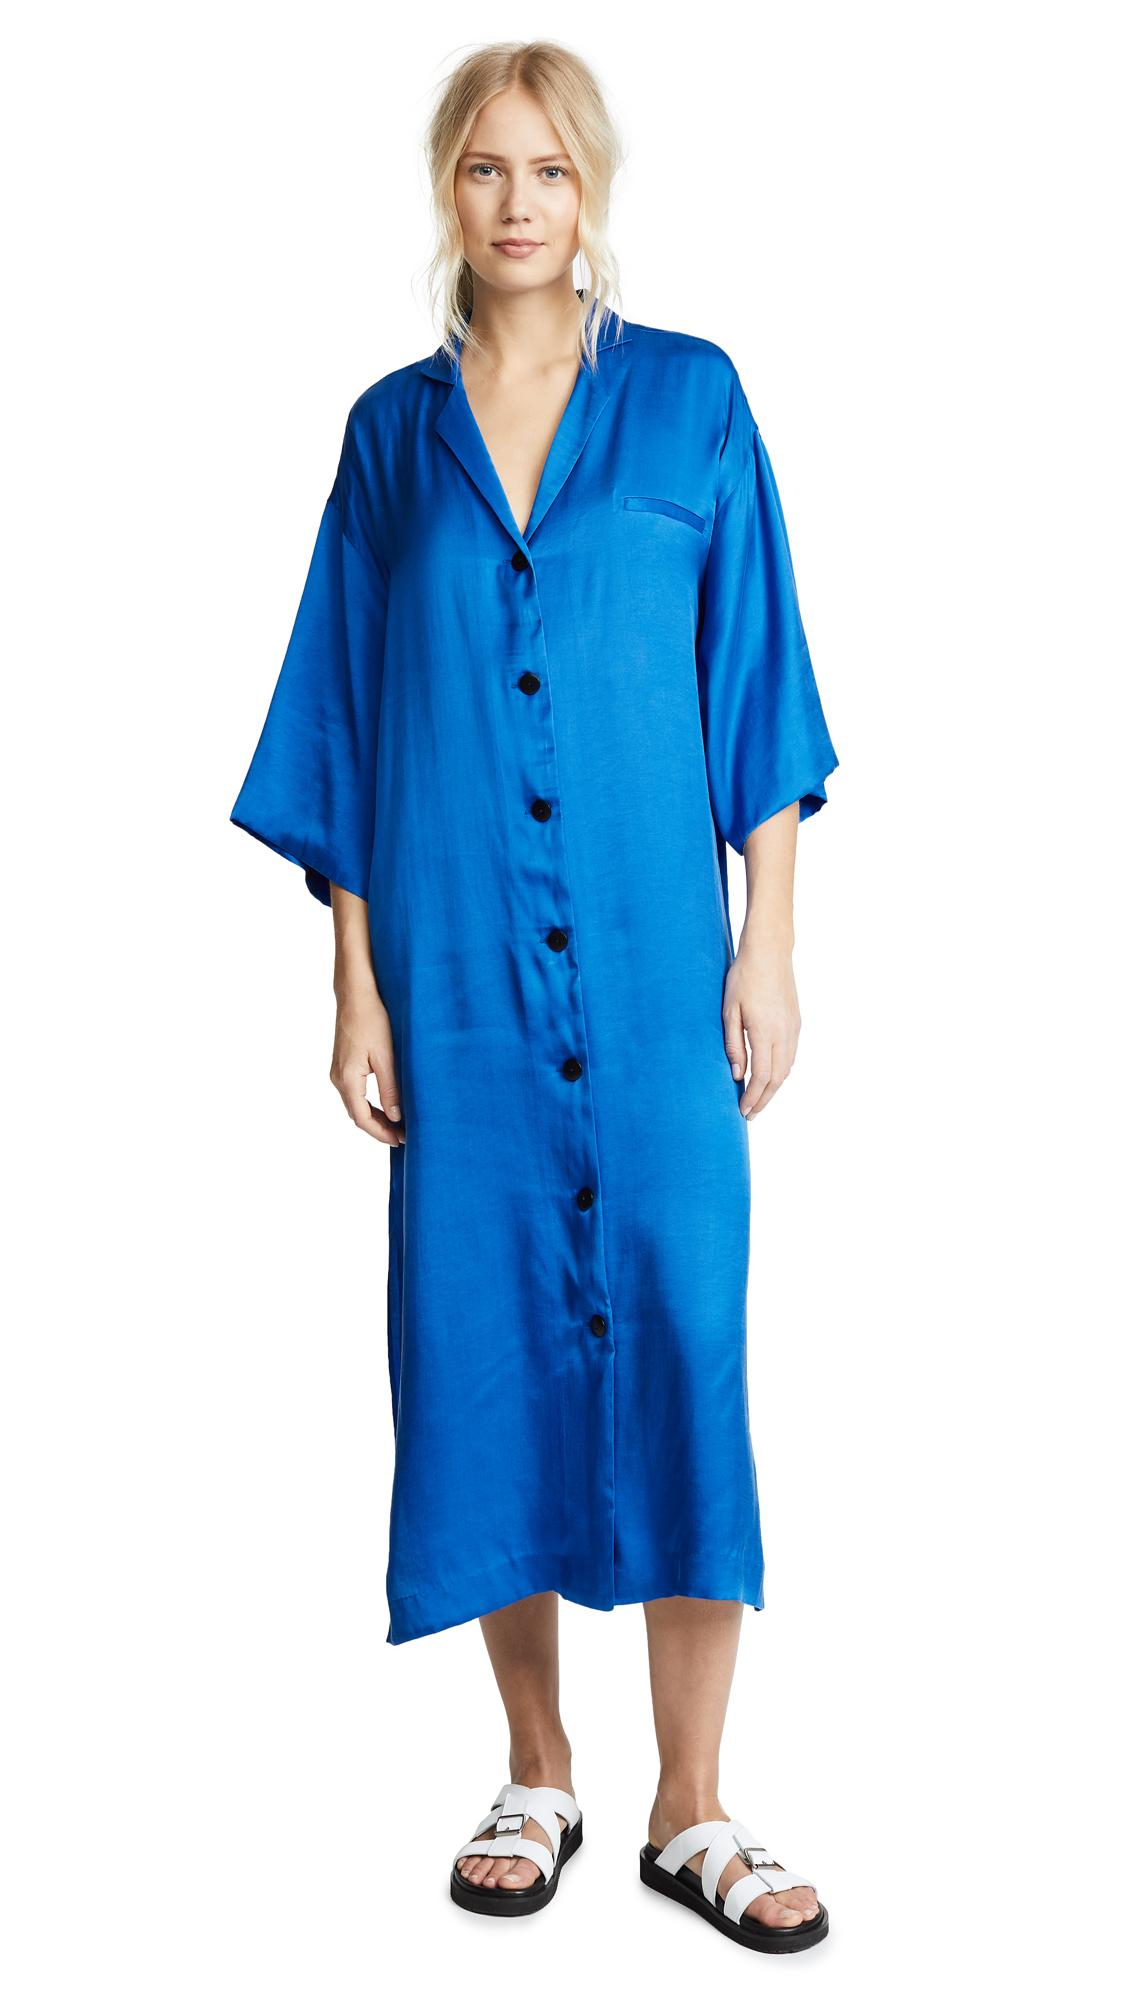 Mara Hoffman Saga Shirt Dress In Blue